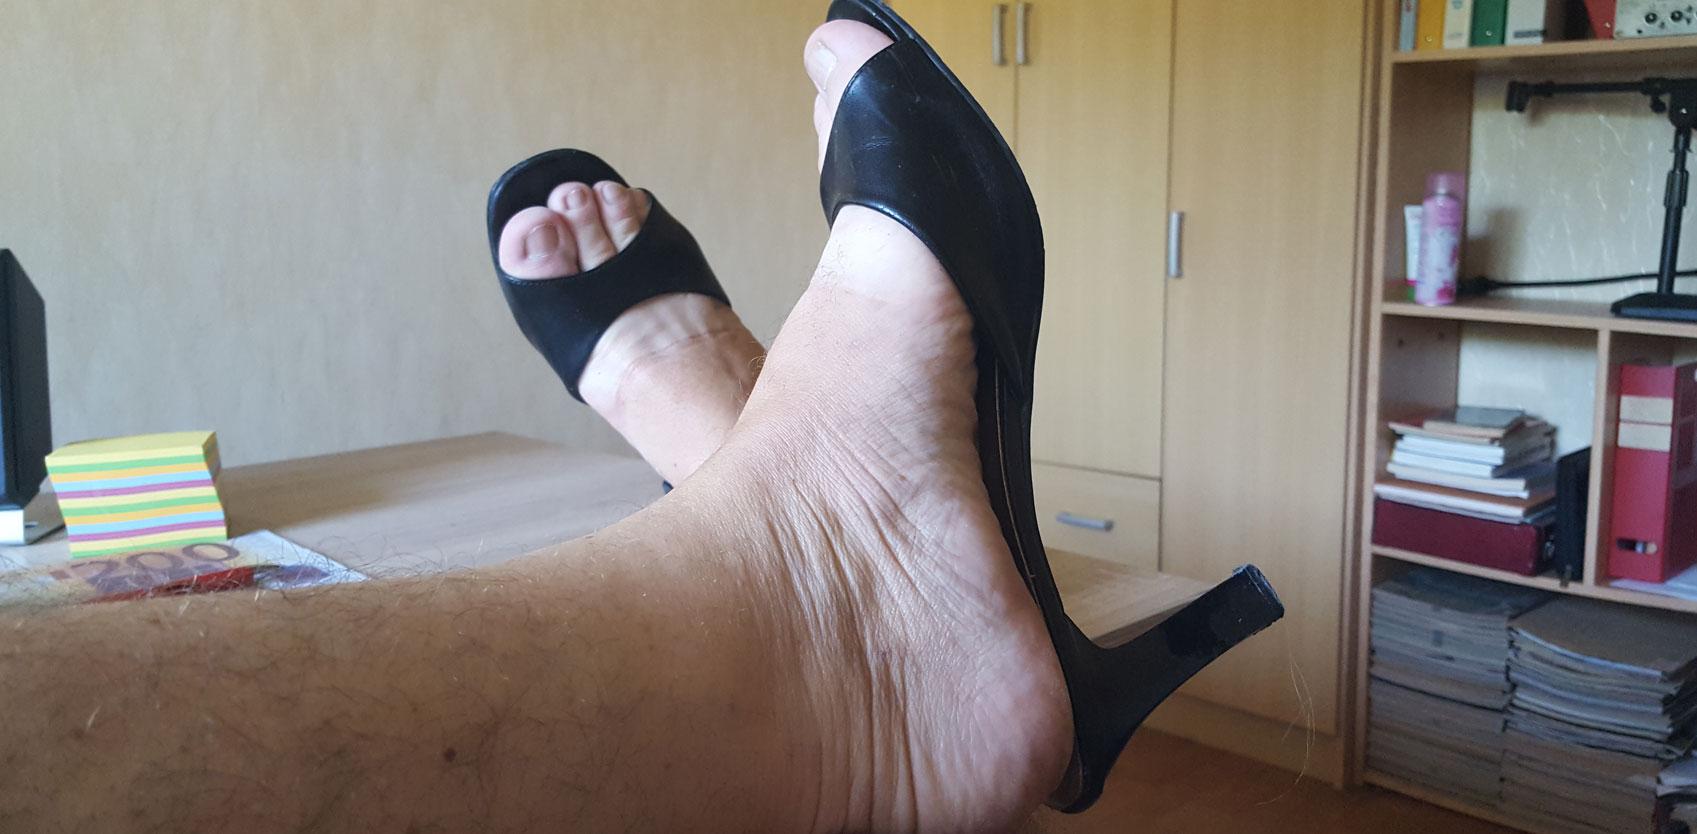 Mec en chaussures féminines